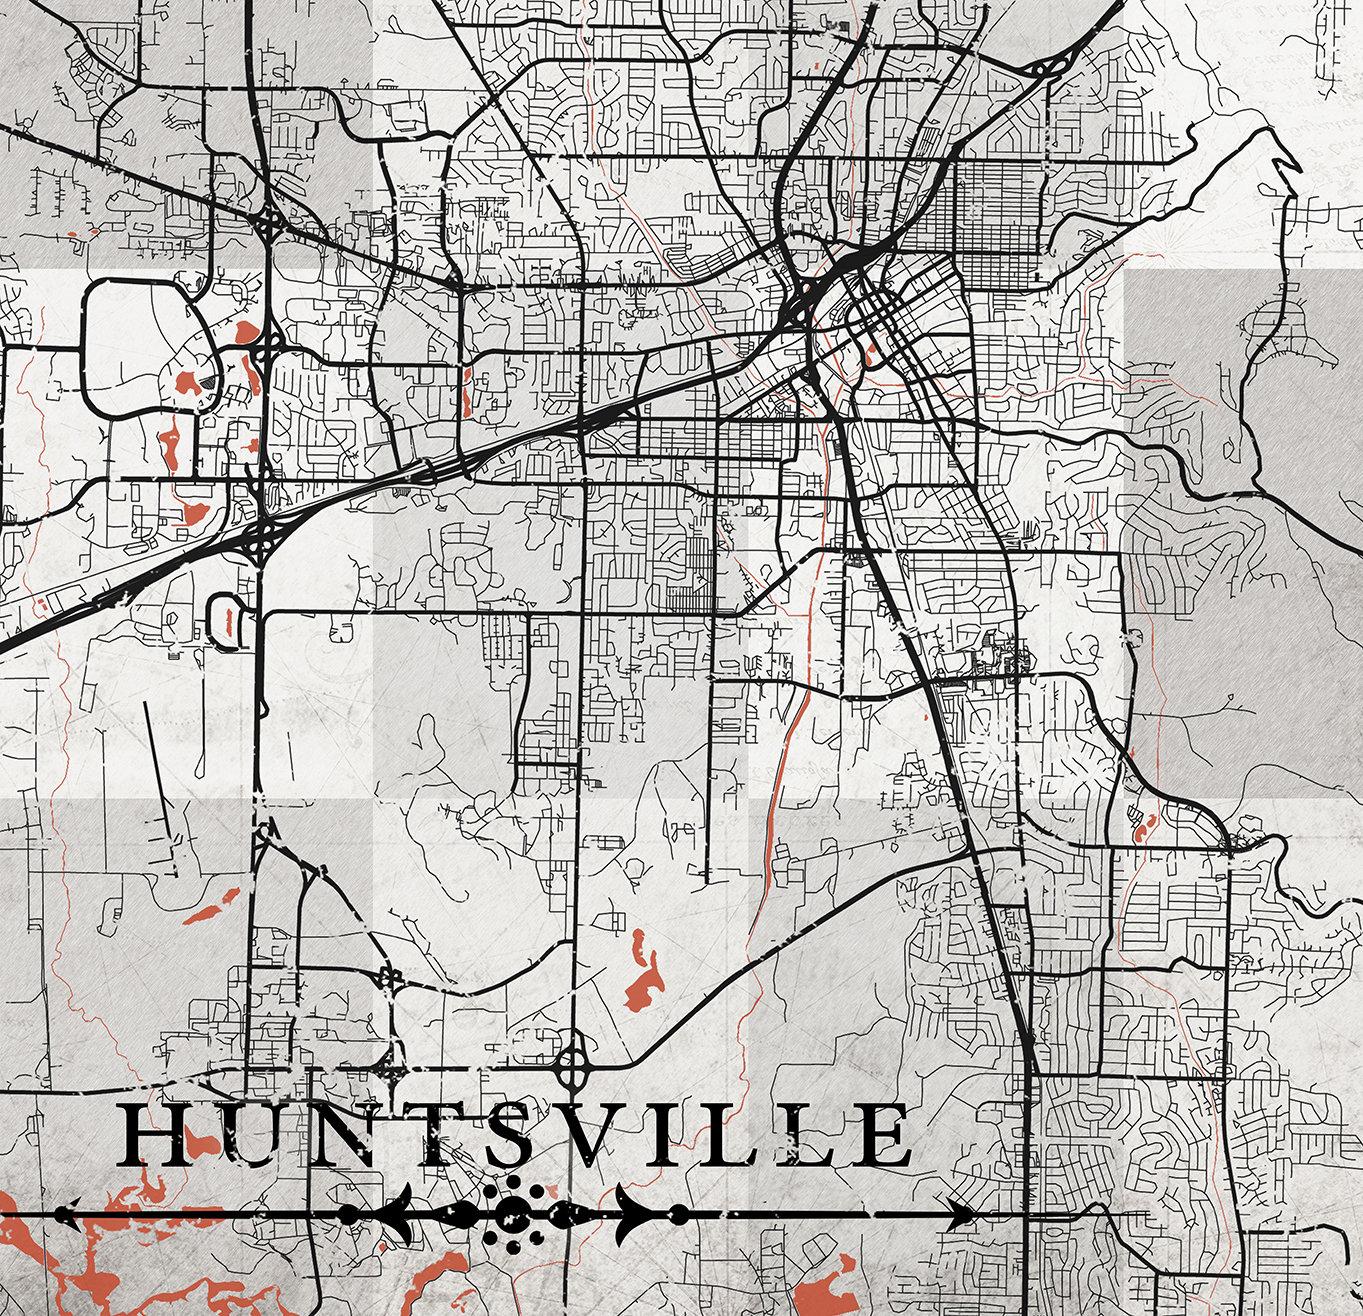 HUNTSVILLE AL Canvas Print AL Alabama Vintage map Huntsville ...